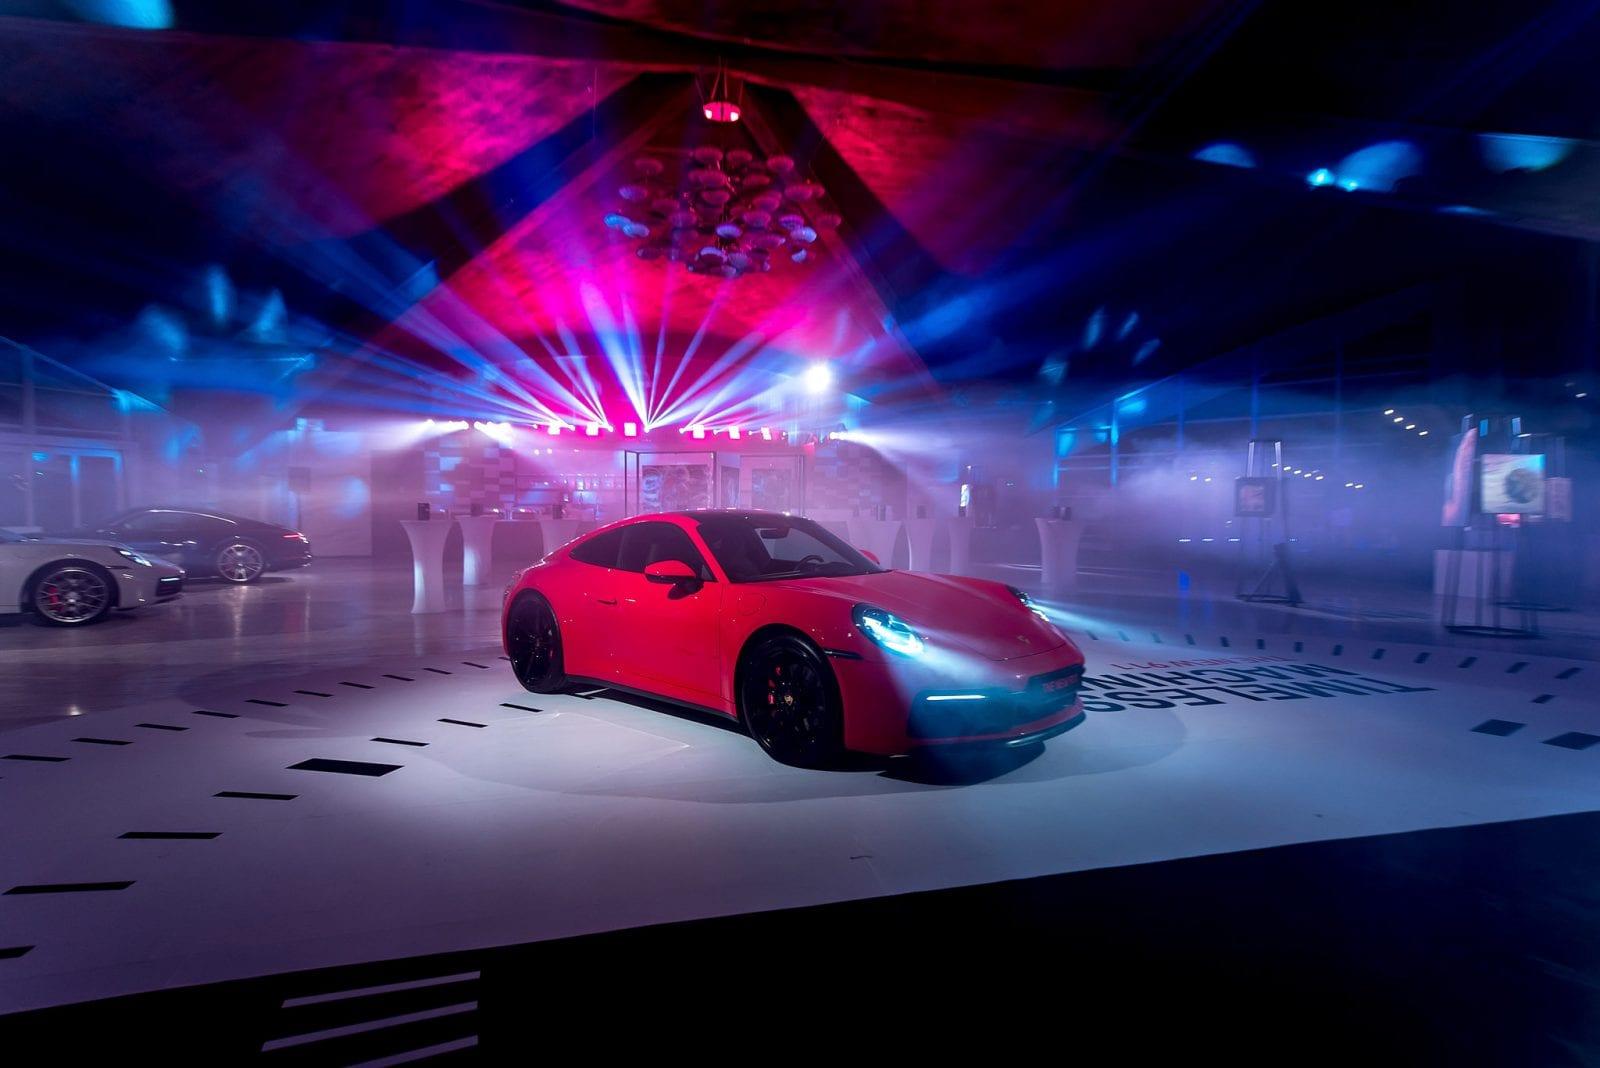 911... 72 - Noul Porsche 911 – o mașină sport high-tech, cu design emblematic